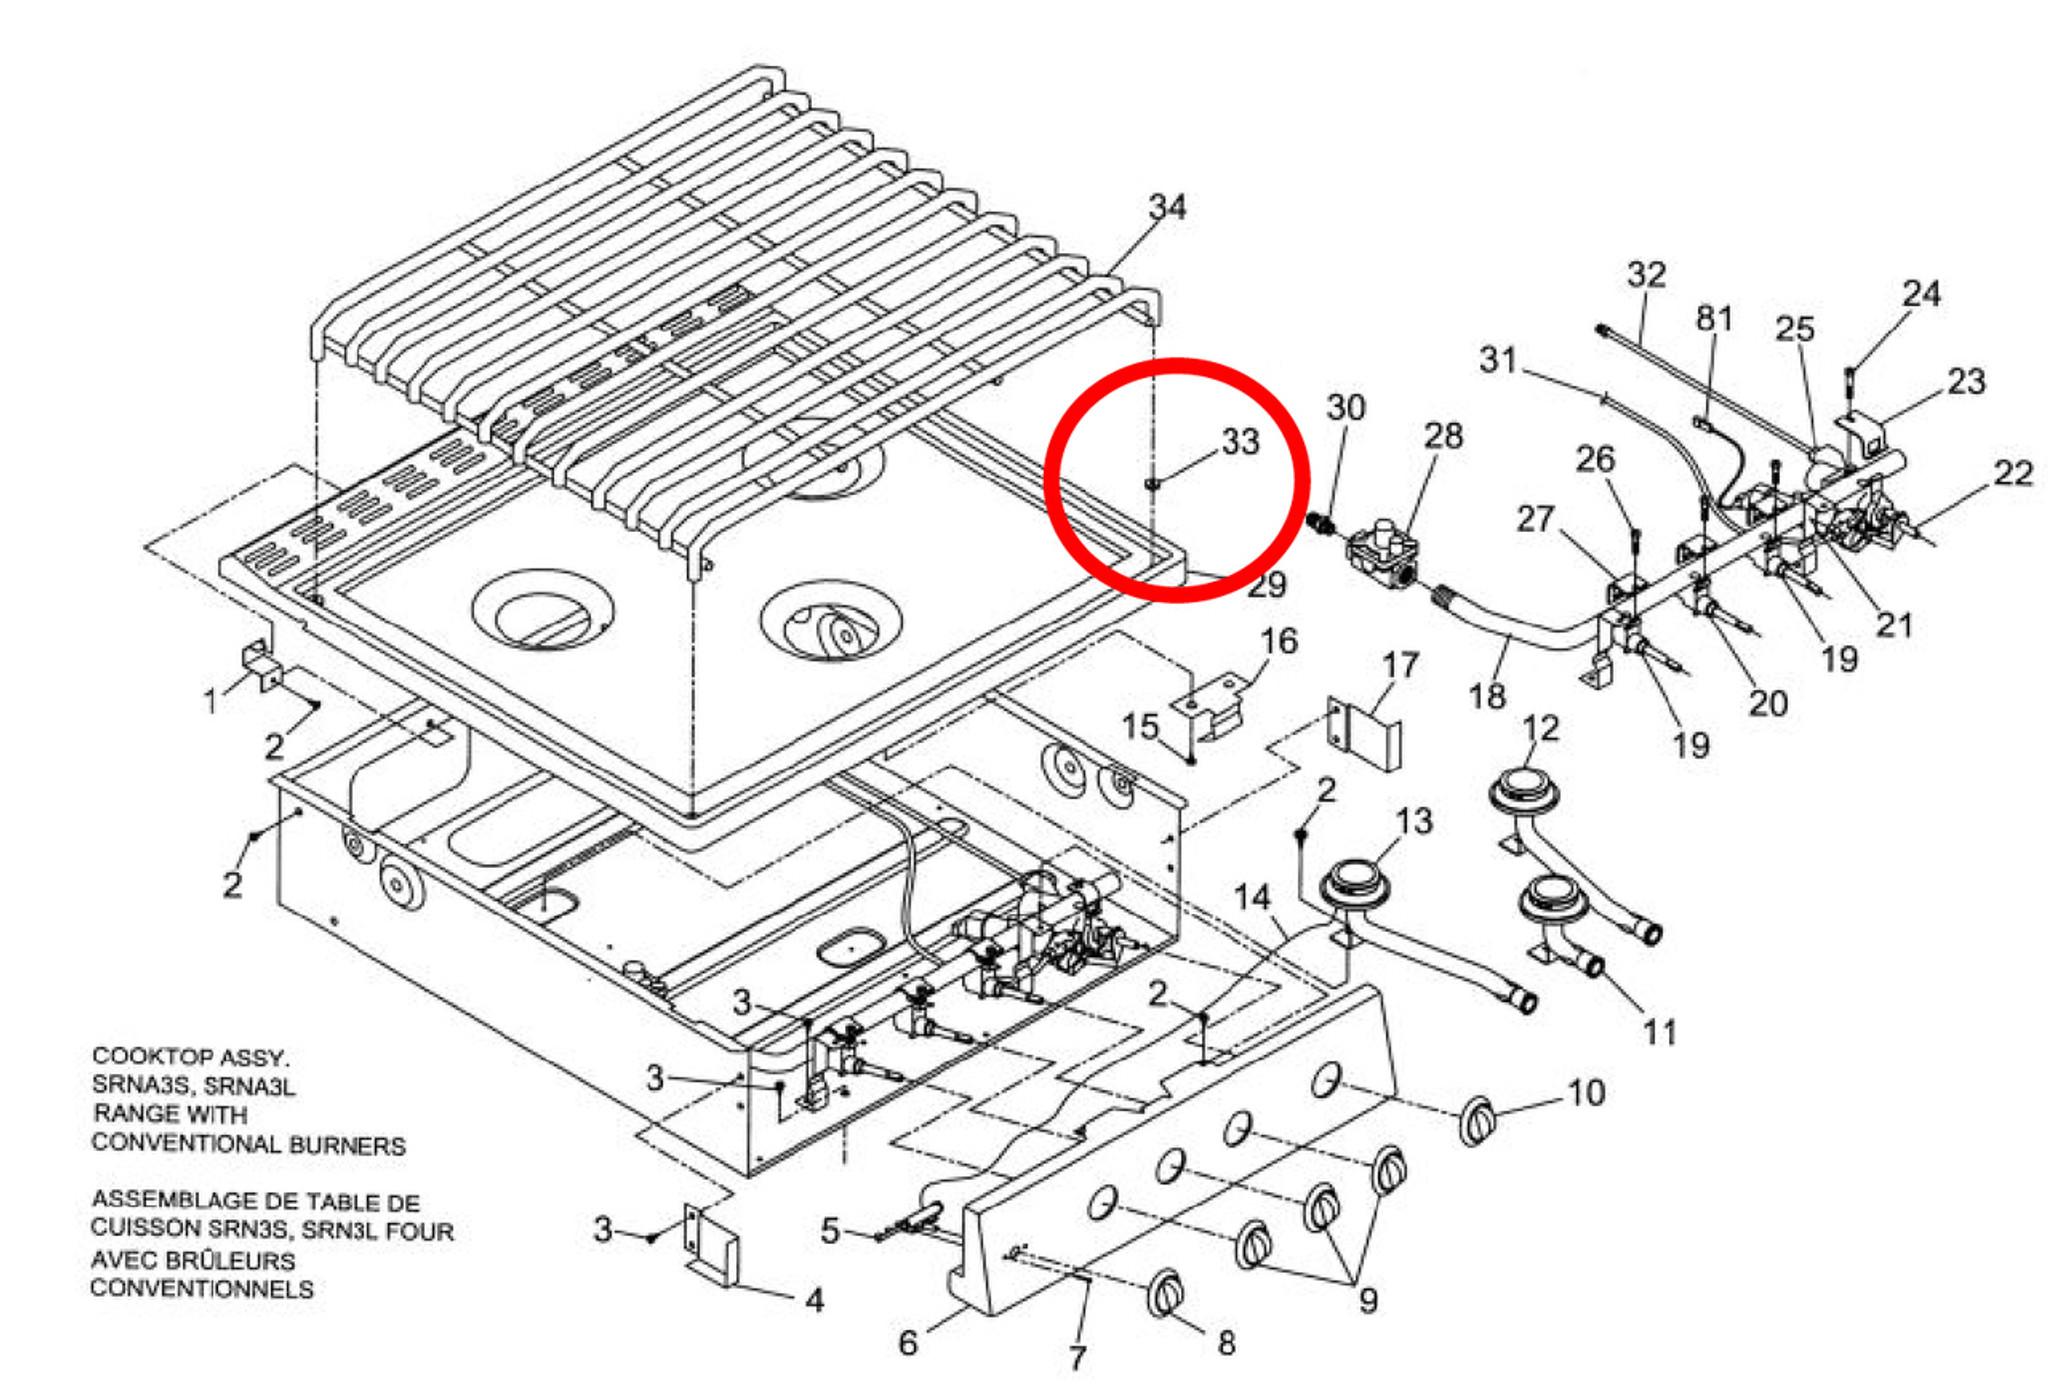 medium resolution of suburban stove grate grommet 071129 fits most models suburban rv rv stove diagram